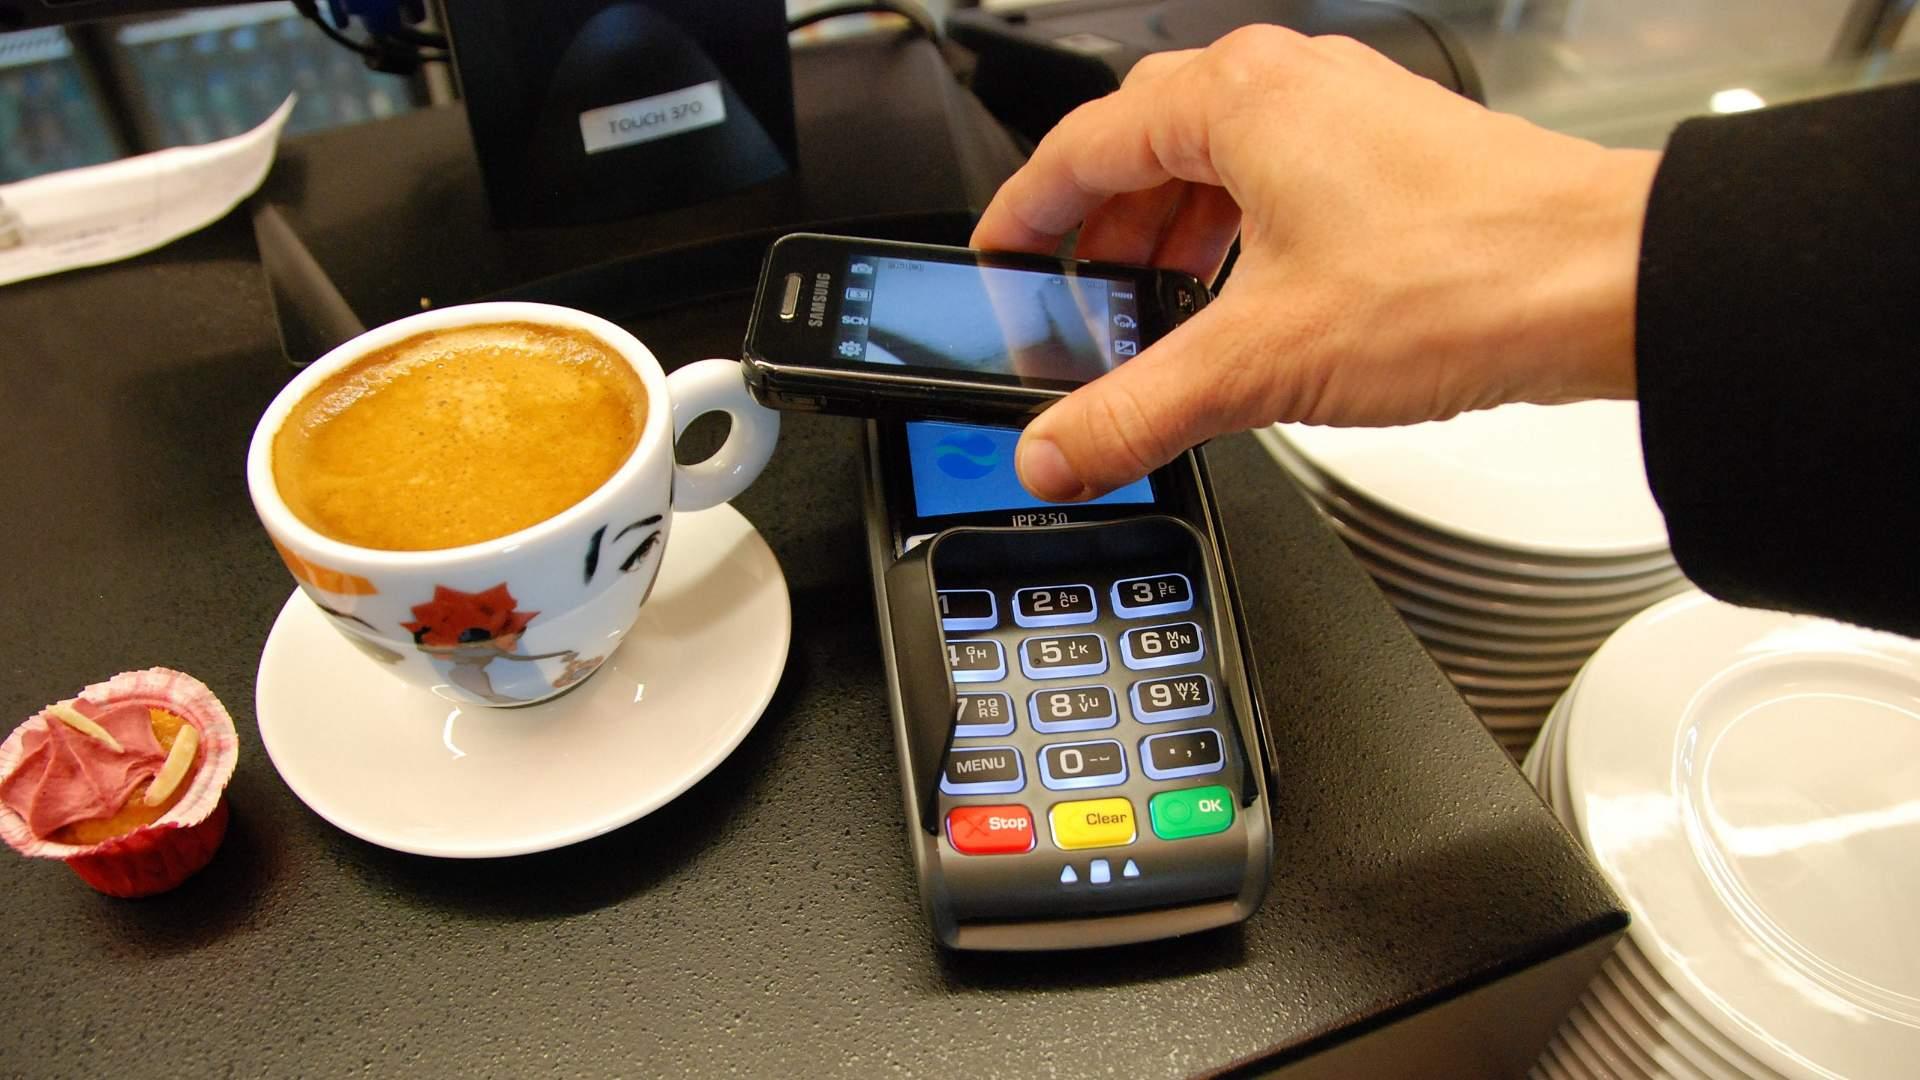 erinteses mobilfizetes apple pay google pay gpay Magyarorszagon mobiltarca